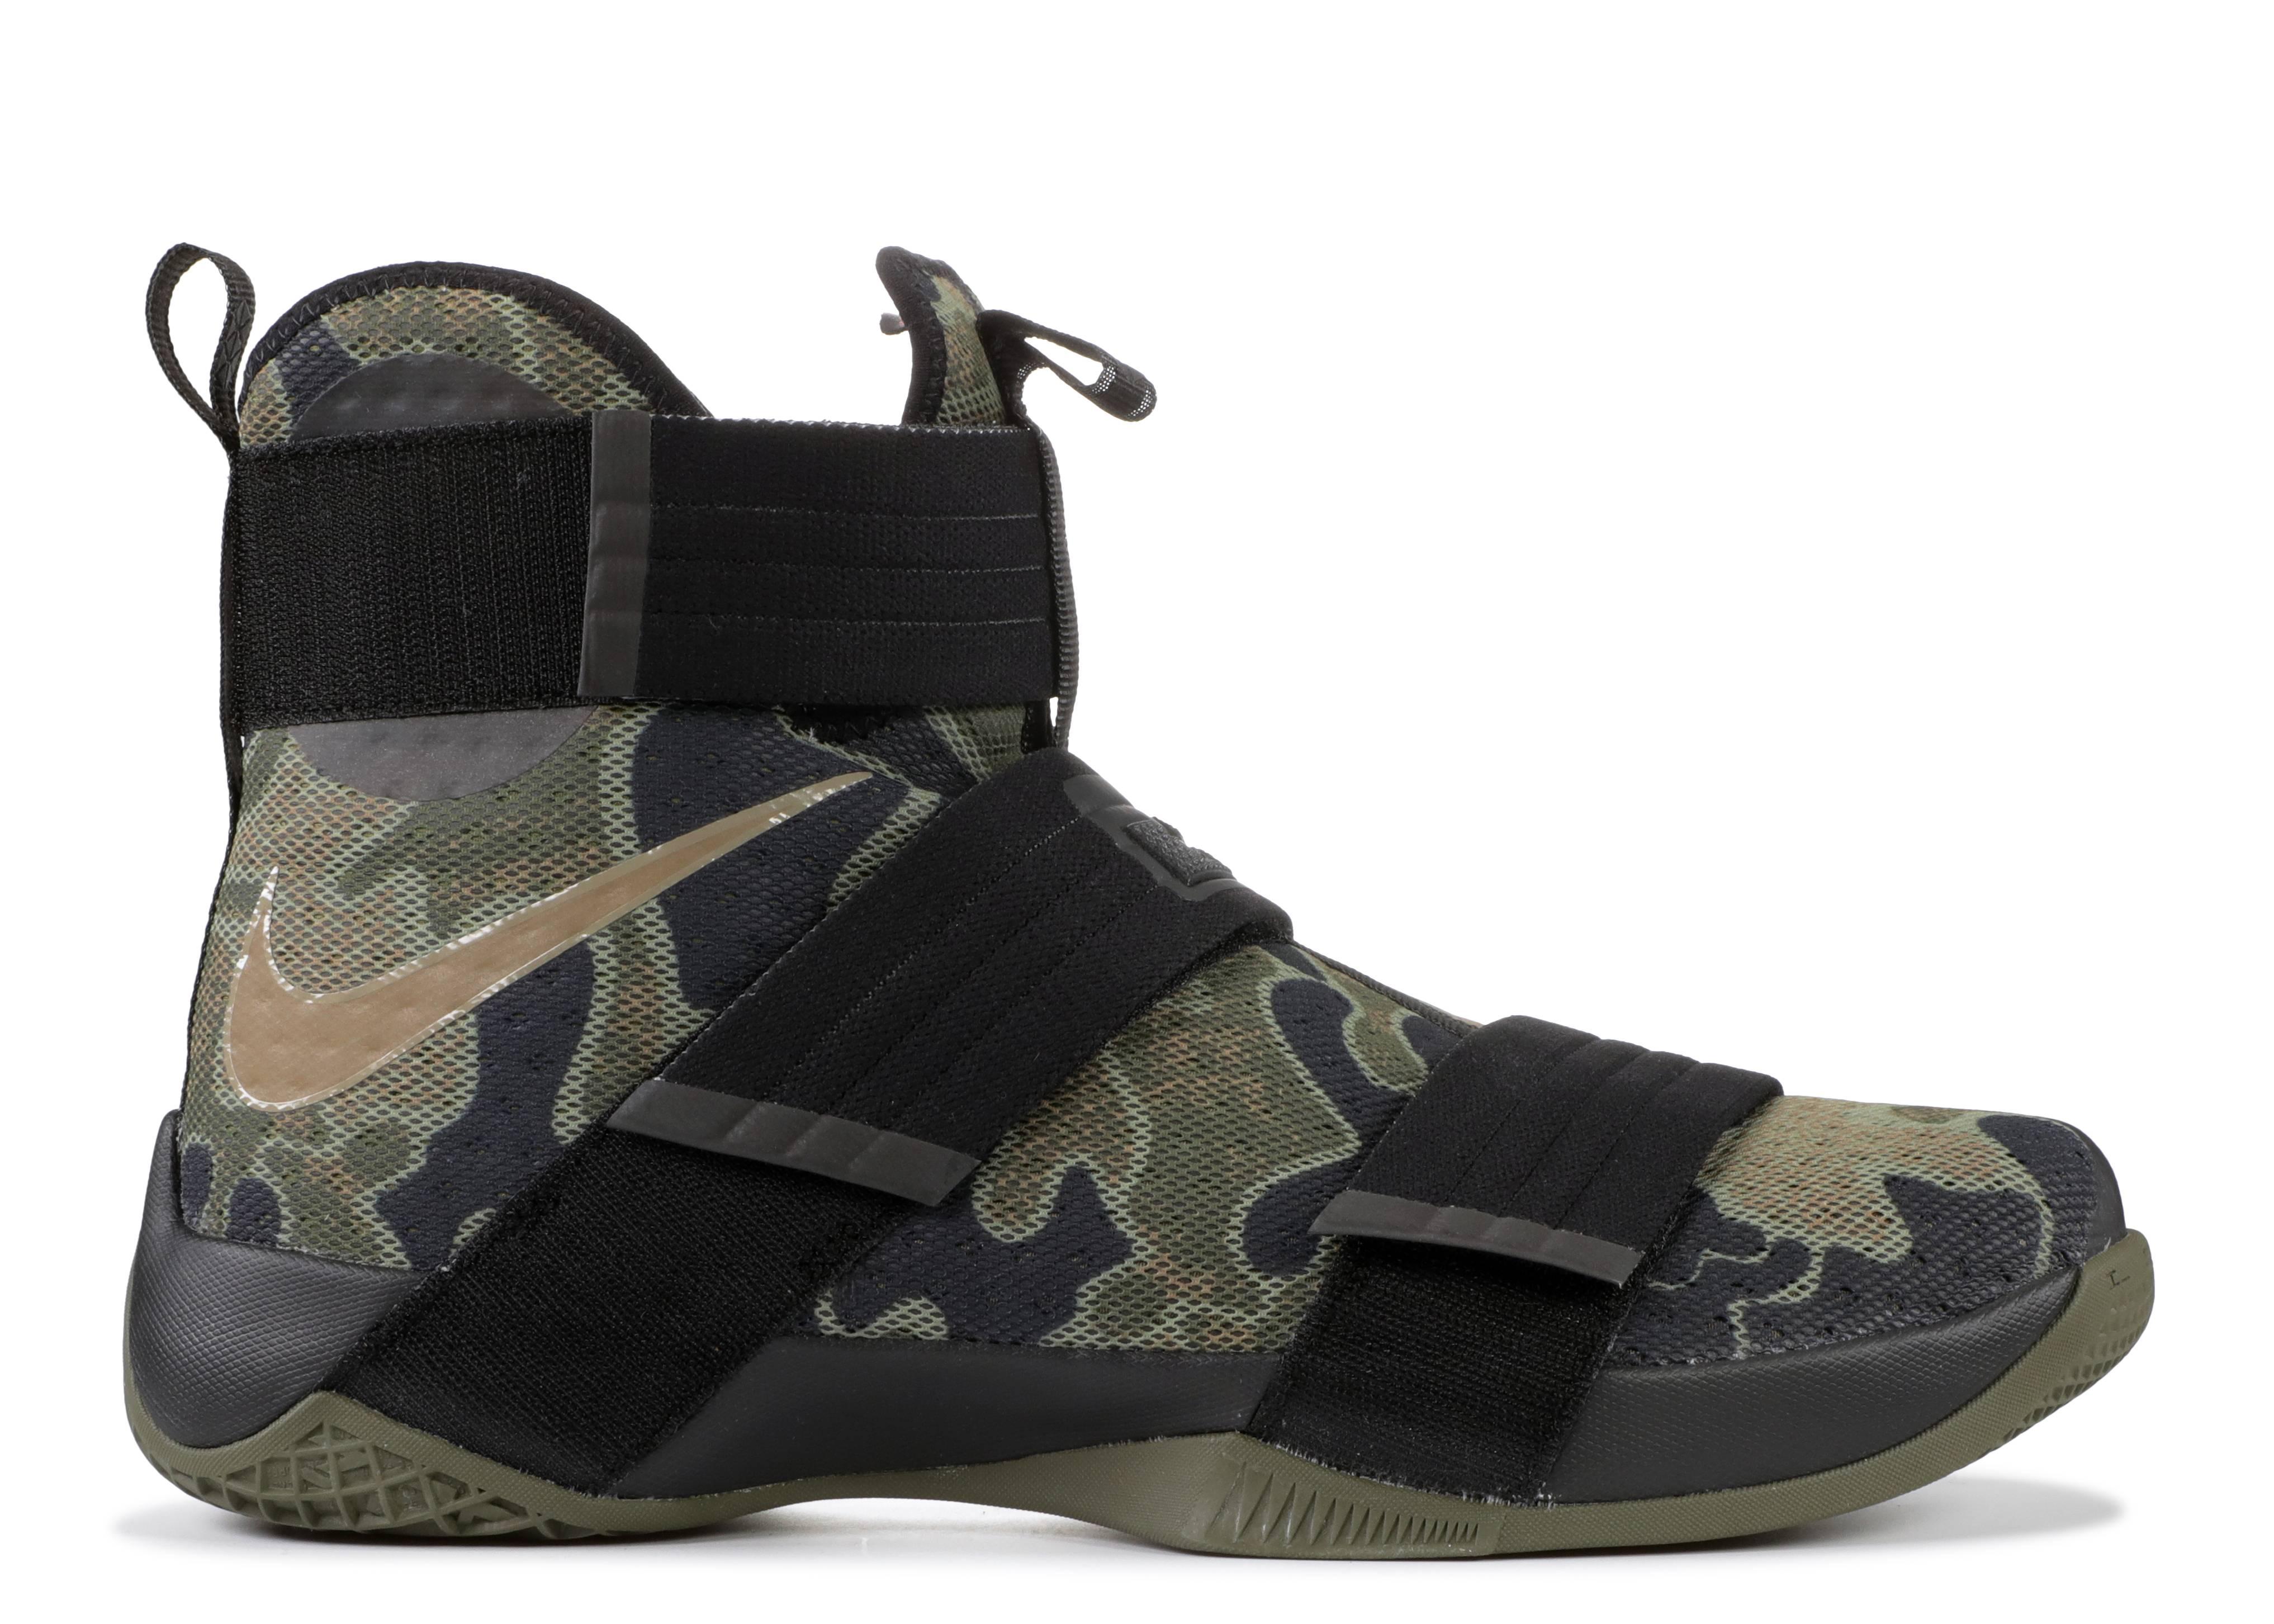 Telégrafo Fantasía Frotar  Zoom LeBron Soldier 10 'Camo' - Nike - 844378 022 - black/medium olive  green-green bamboo | Flight Club